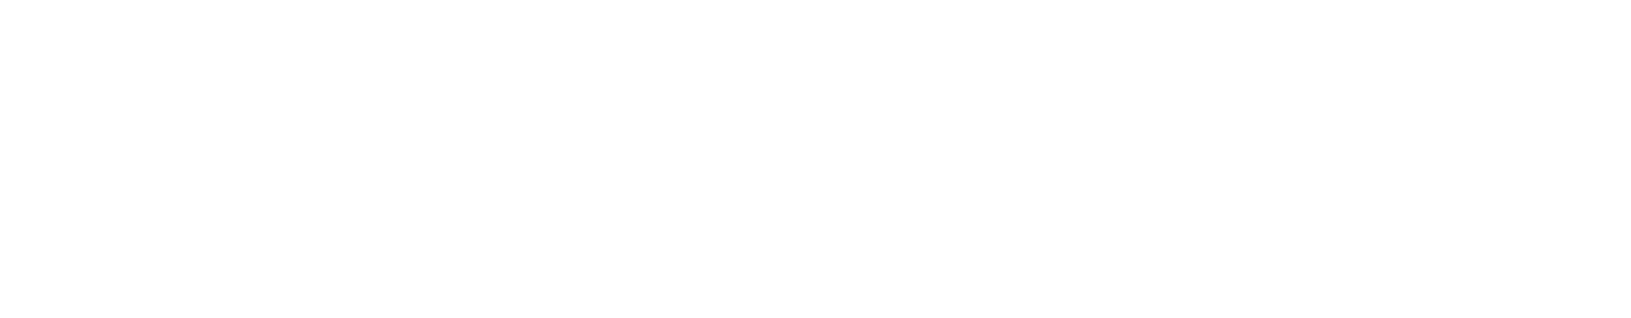 NWMutual-minisite-horizontallogo_v2 (002)